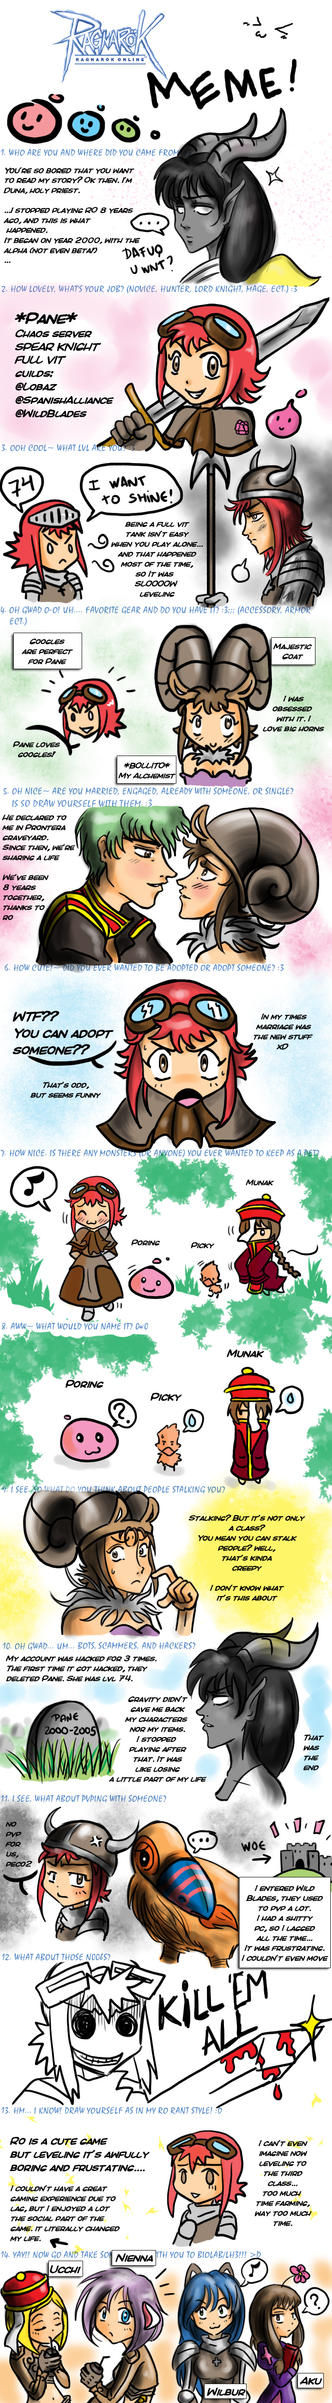 Ragnarok Online Meme by Tsubasanokami by QuietDuna